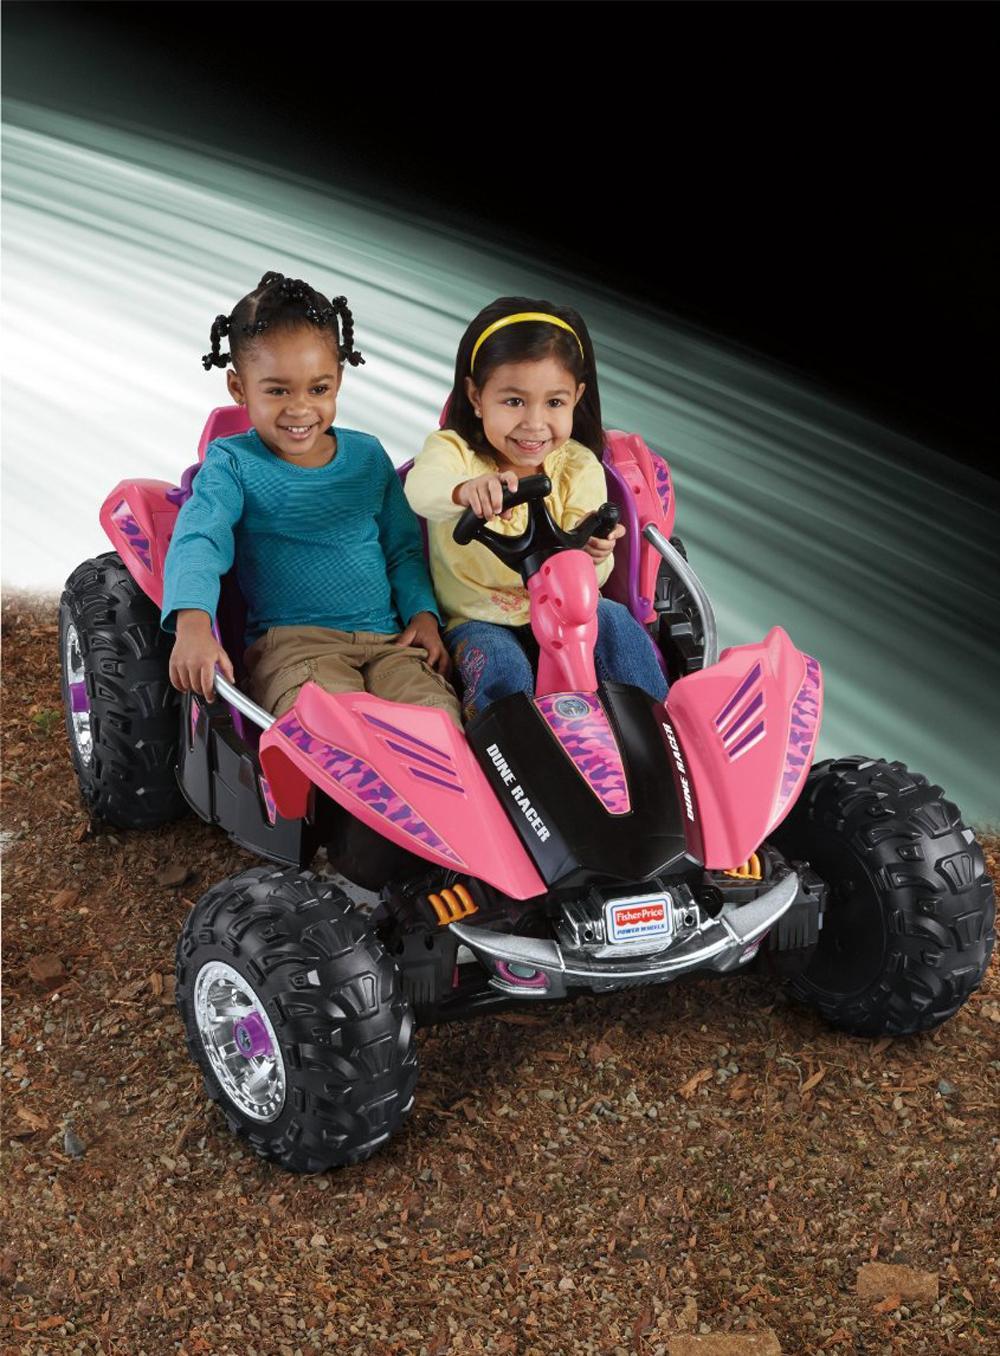 Amazon.com: Power Wheels Dune Racer, Pink/Purple: Toys & Games